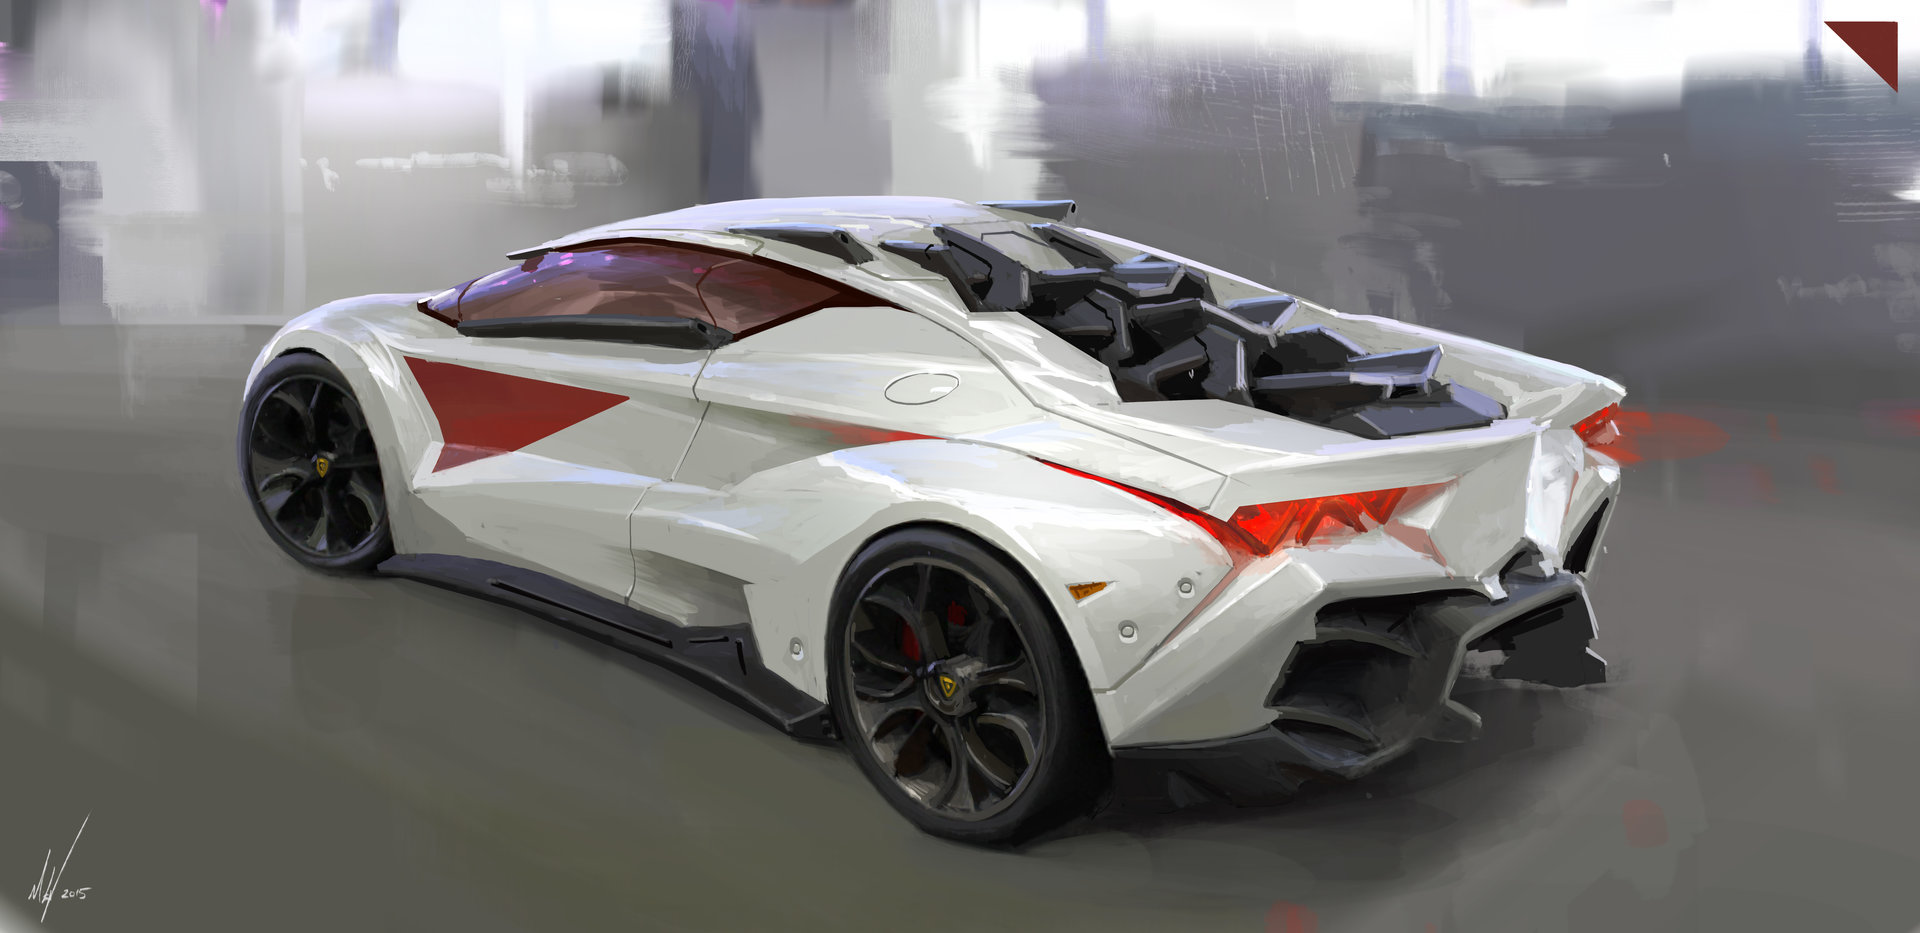 Artstation Lamborghini Concept 2015 Michal Kus